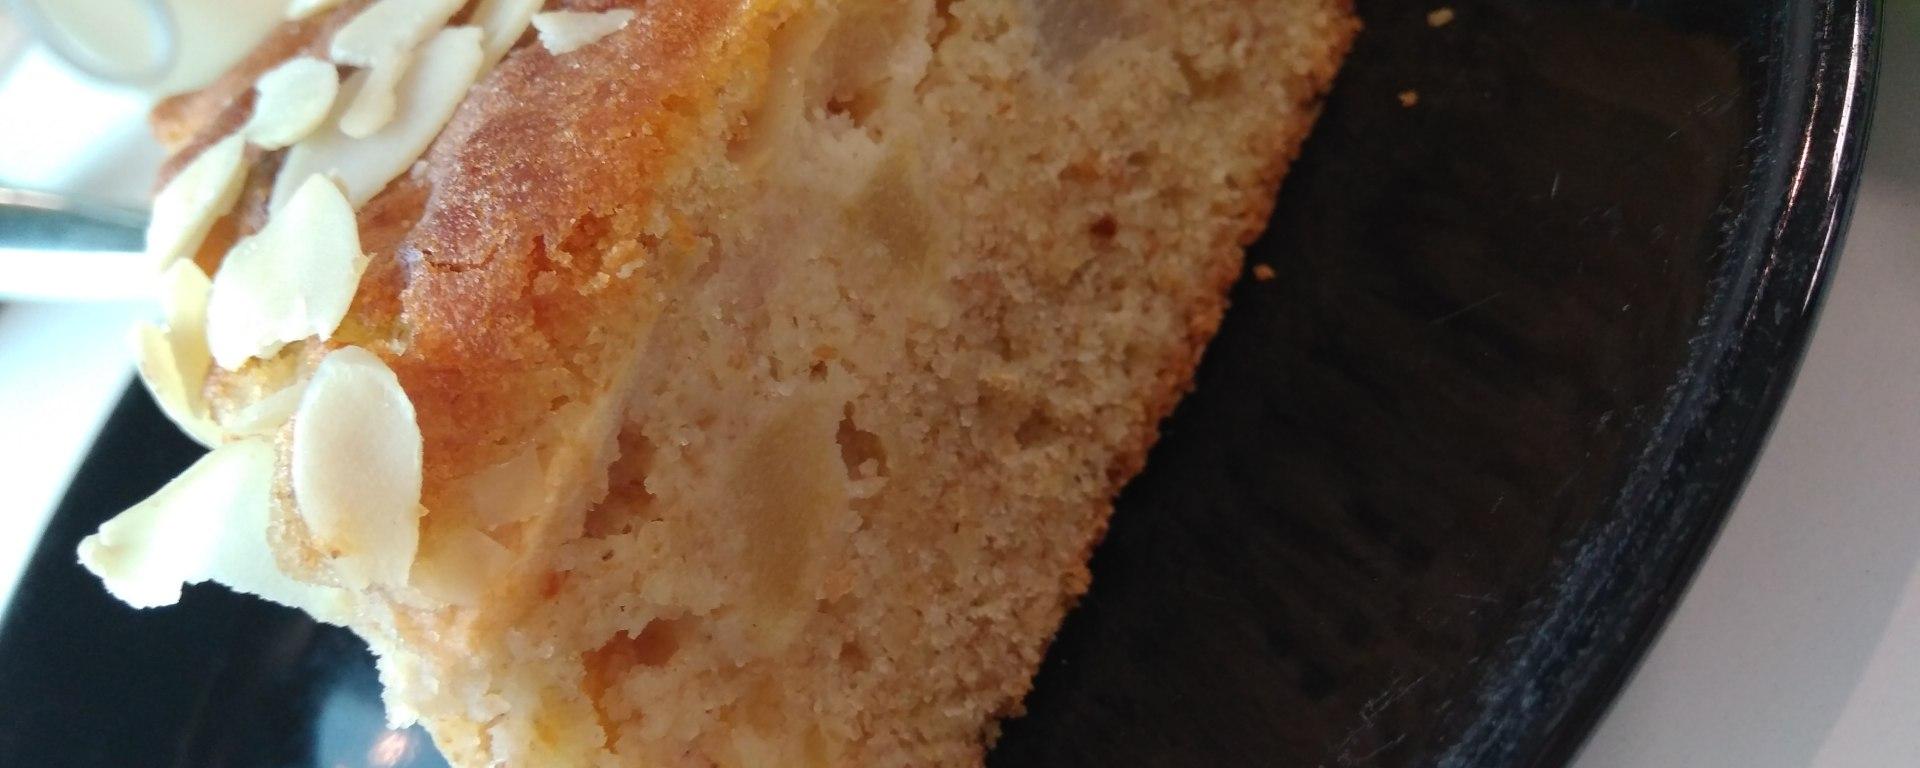 Apple & Pear Vanilla cake